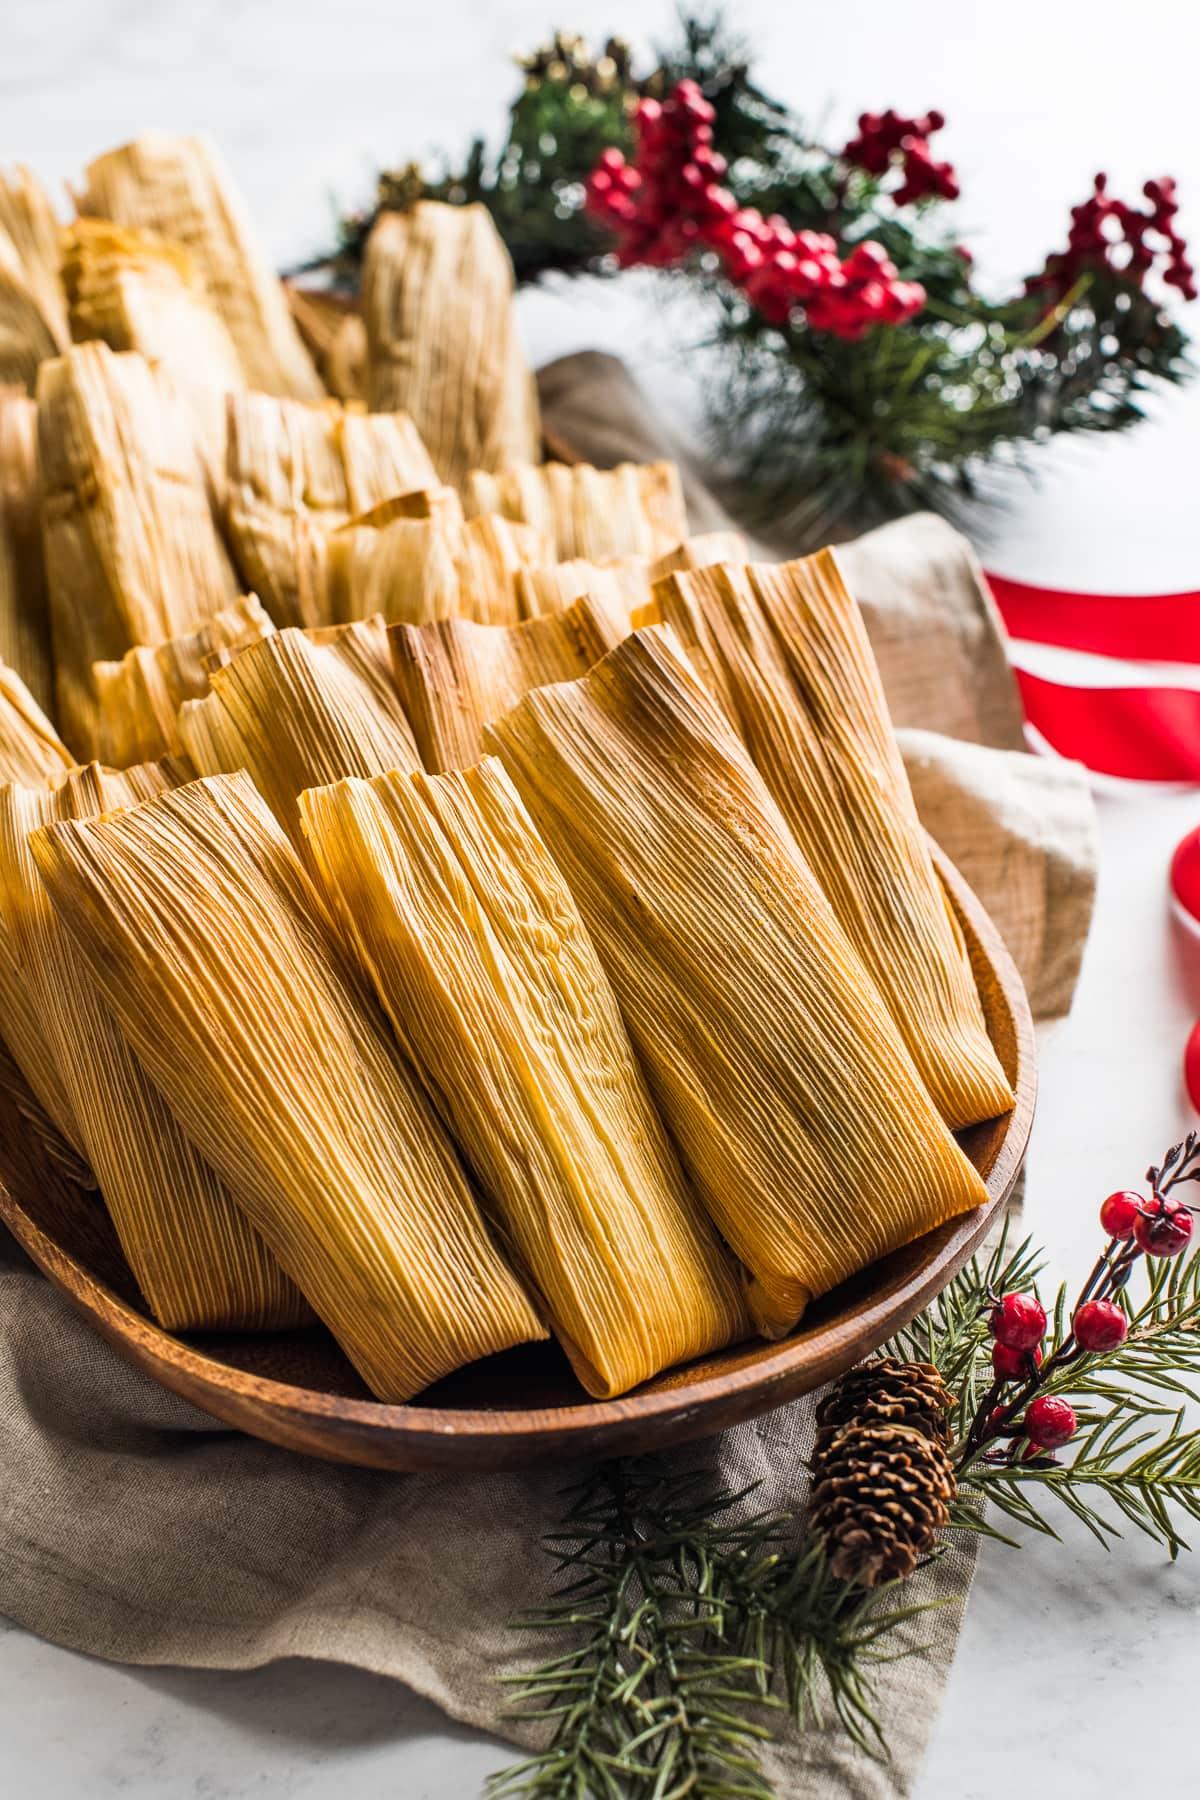 Instant Pot Tamales on a serving platter.